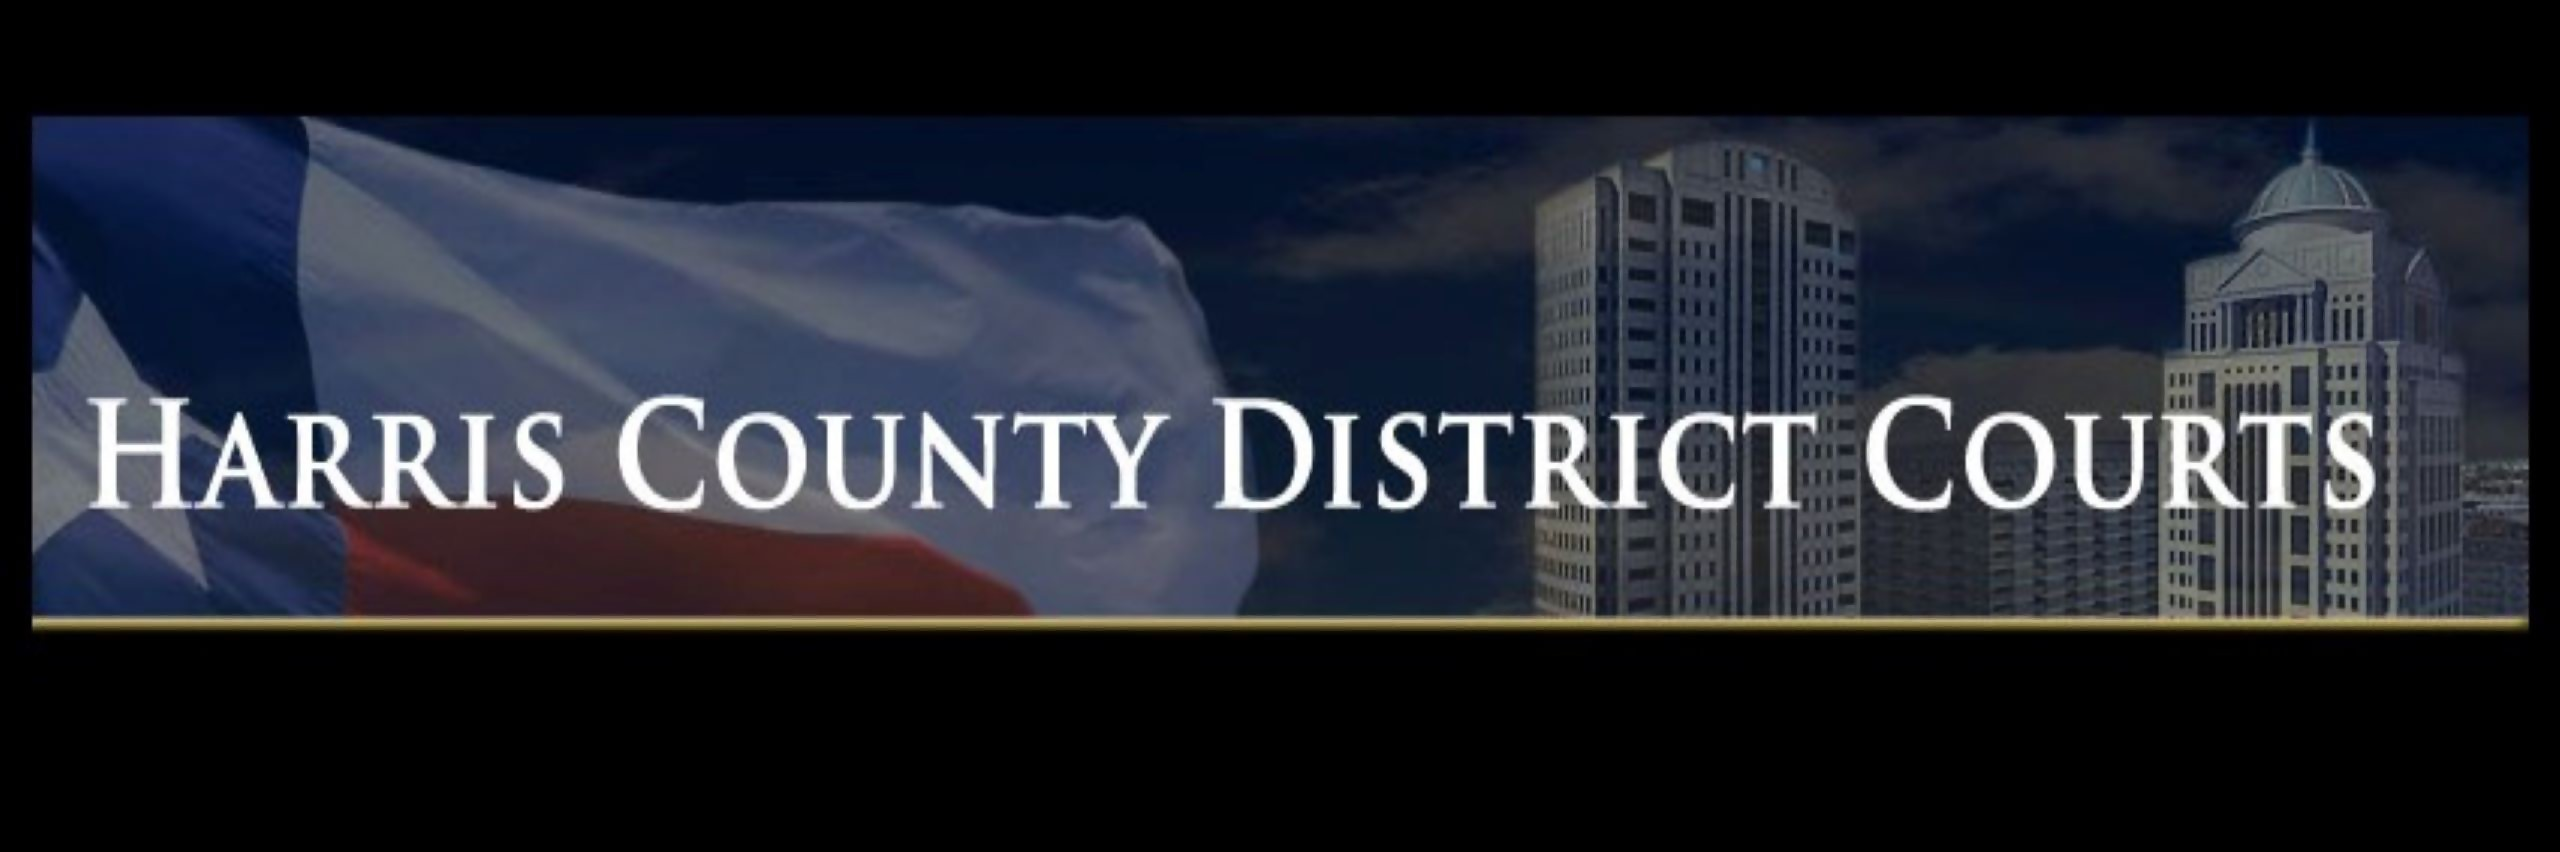 215th District Court - Live Stream